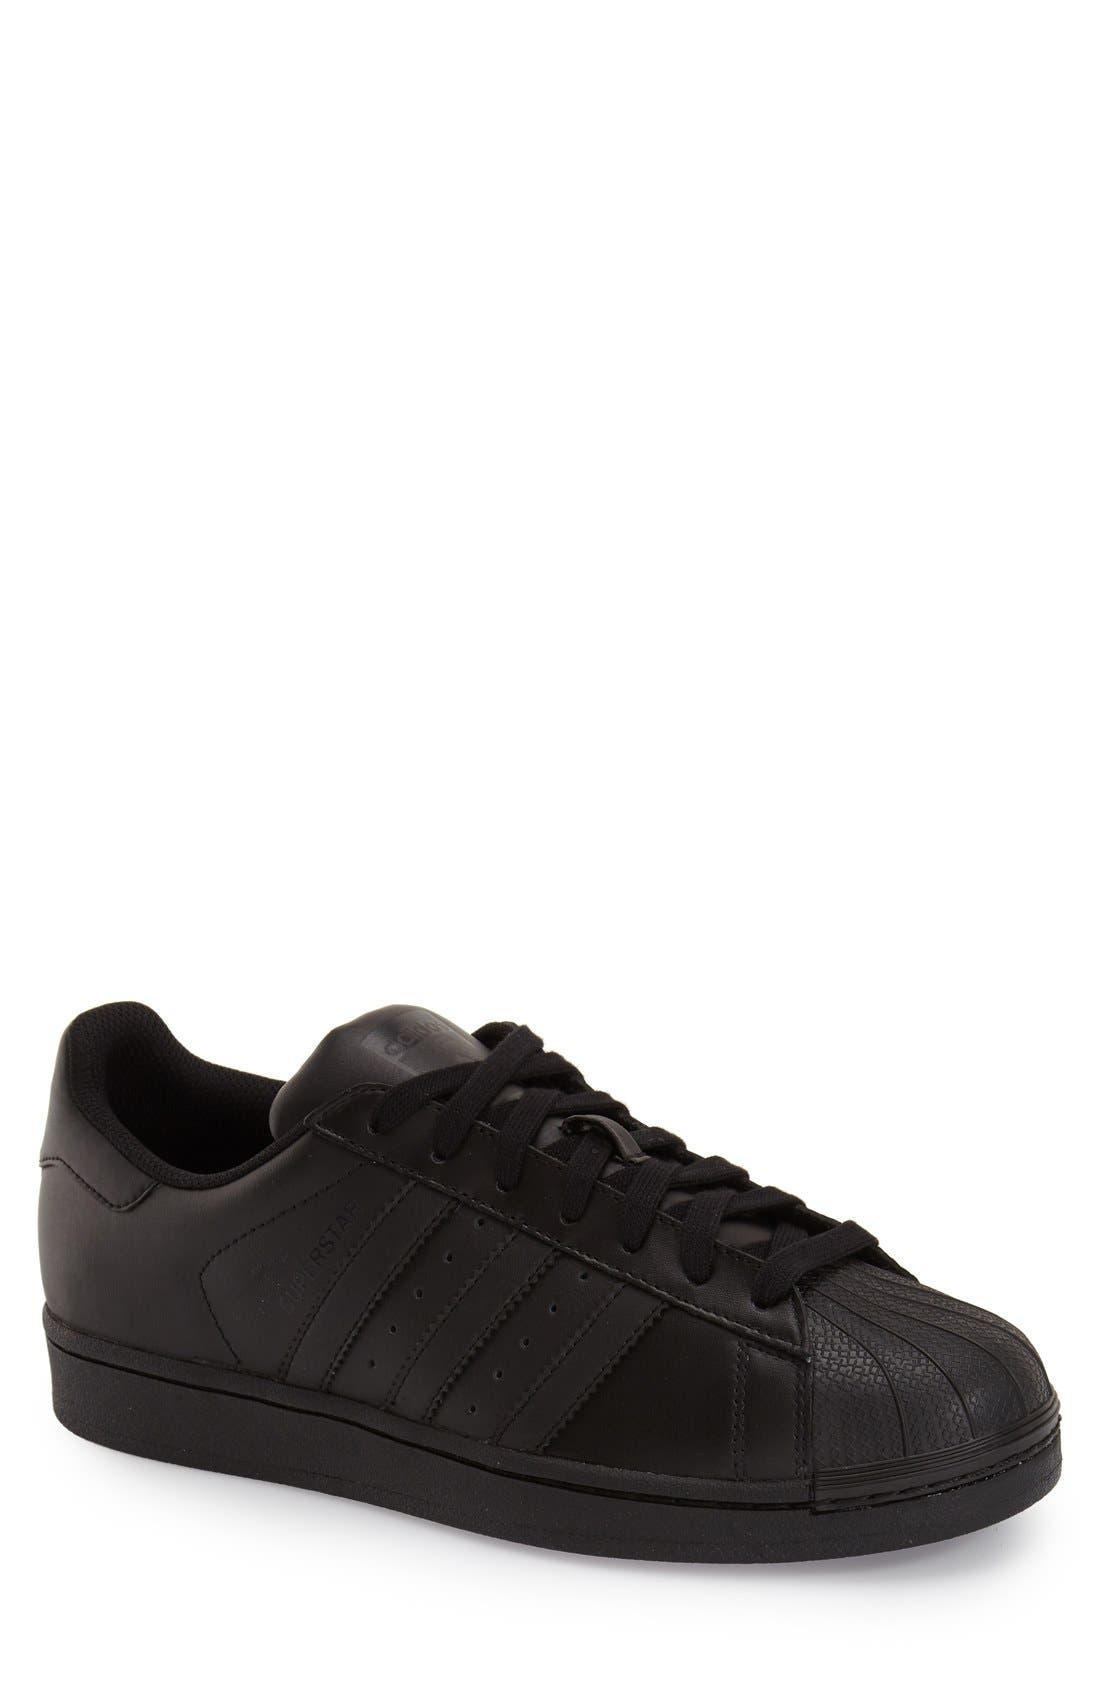 Main Image - adidas 'Superstar Foundation' Sneaker (Men) (Regular Retail Price: $79.95)